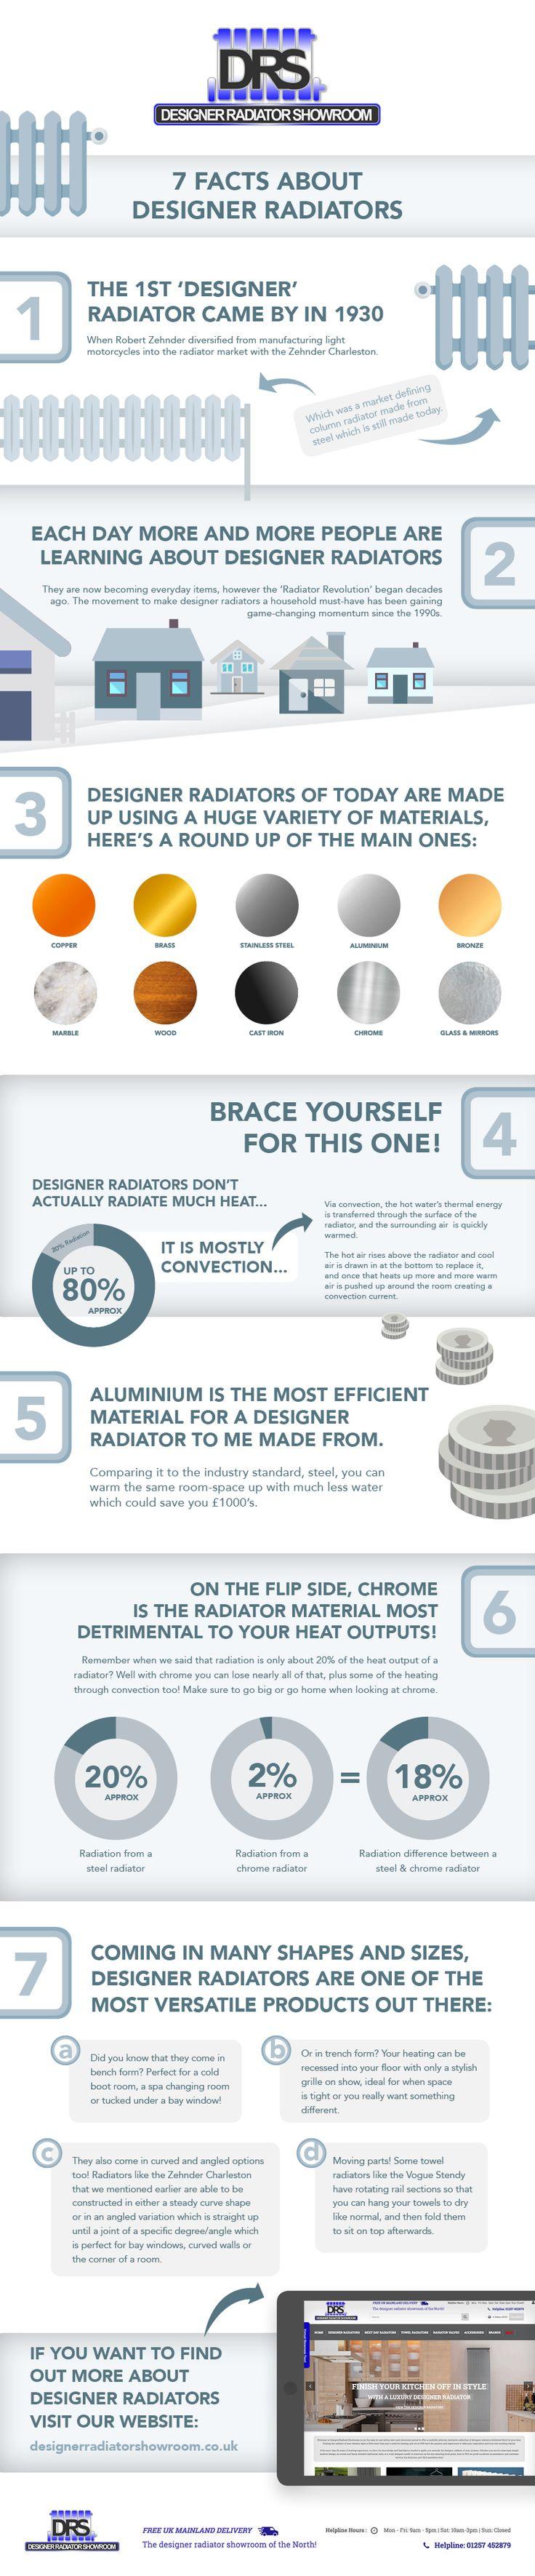 7 Facts About Designer Radiators